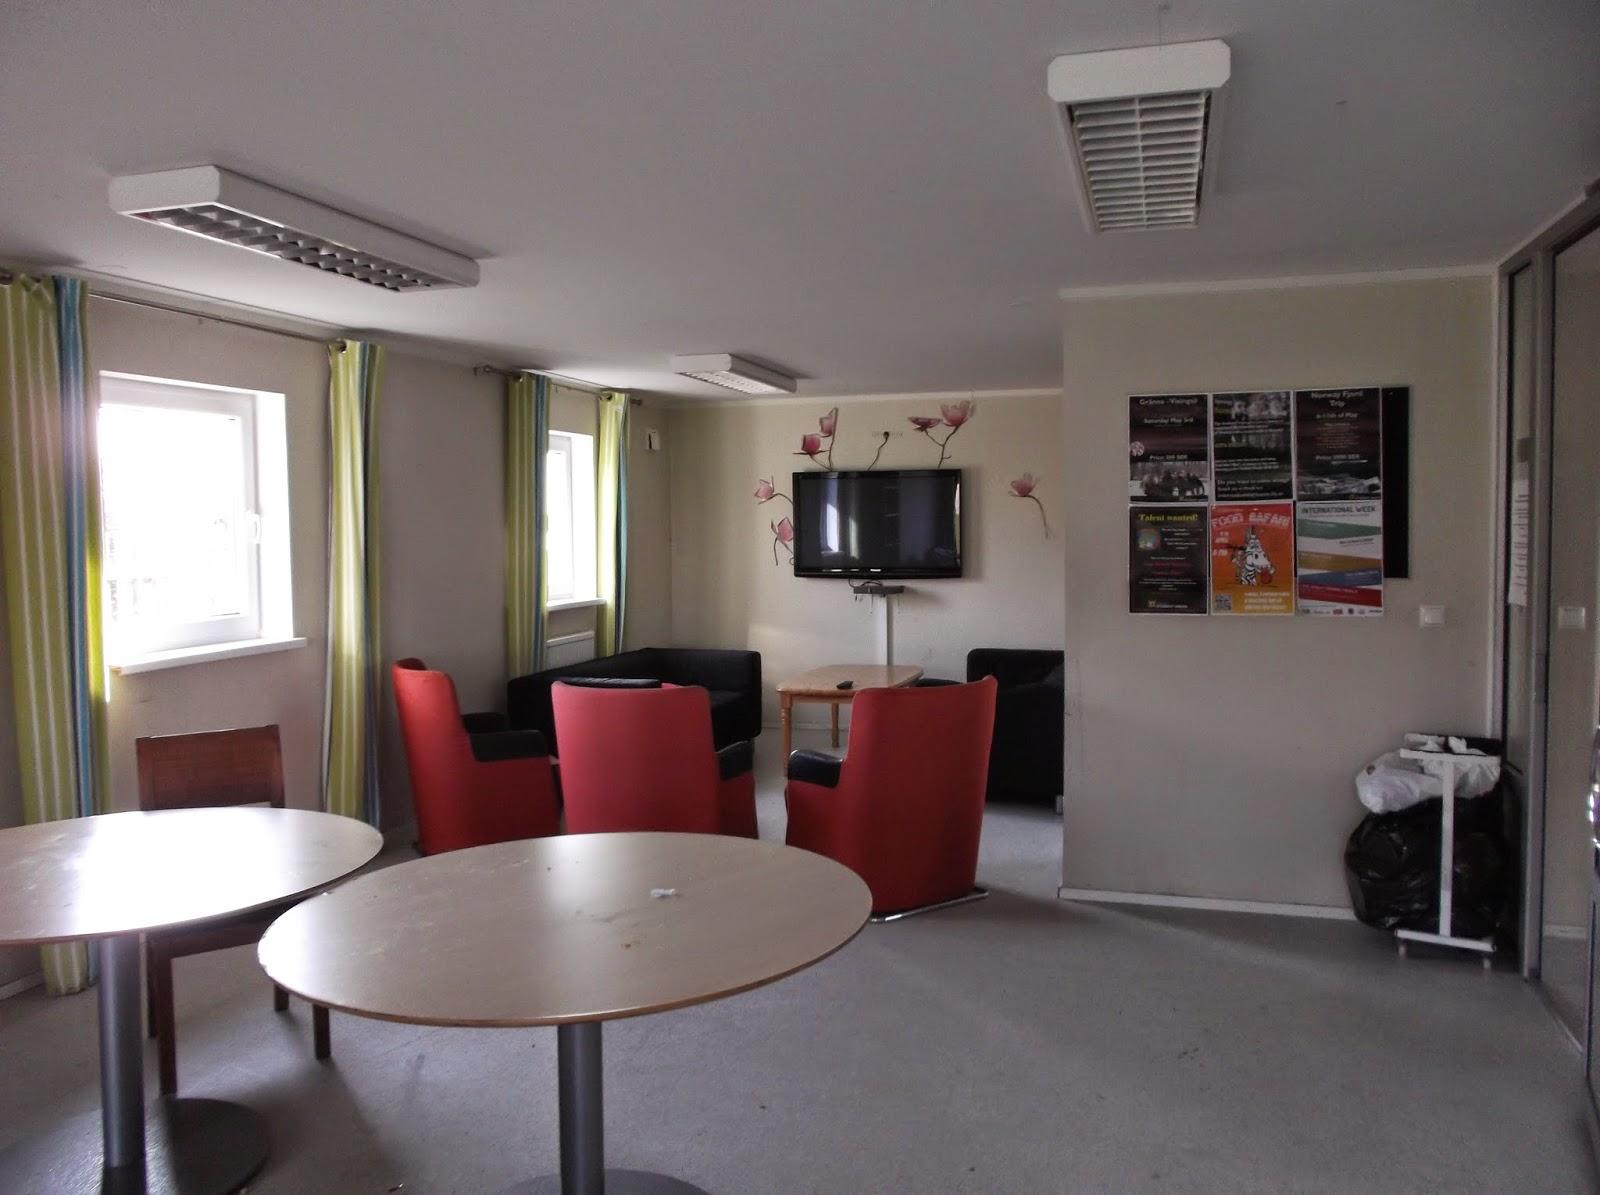 Jönköping University Accommodations for International Students Ekhagen apartments